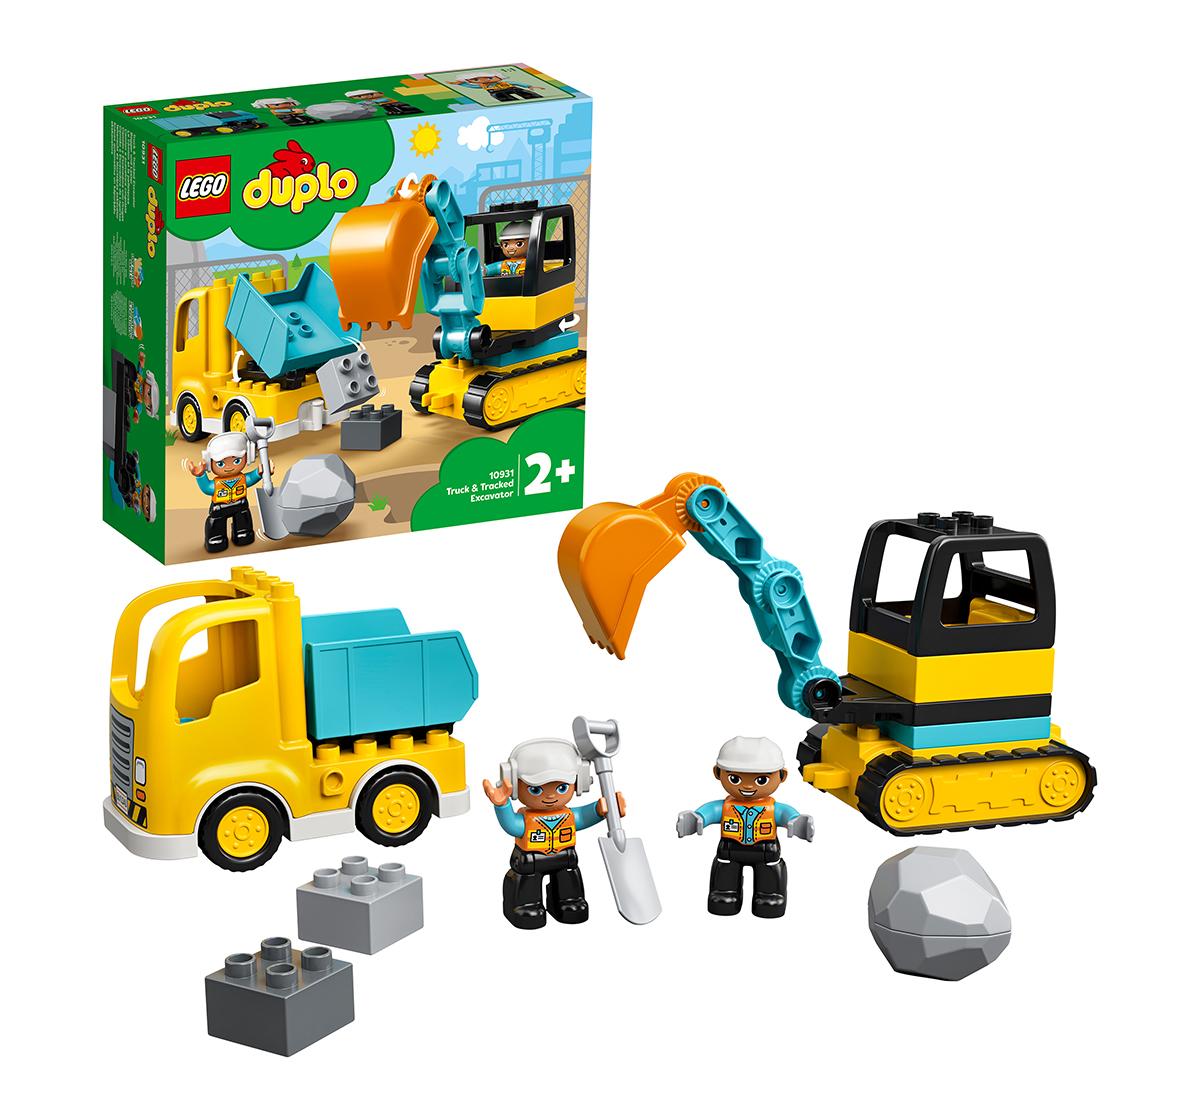 LEGO | LEGO 10931 Truck & Tracked Excavator Lego Blocks for Kids age 2Y+